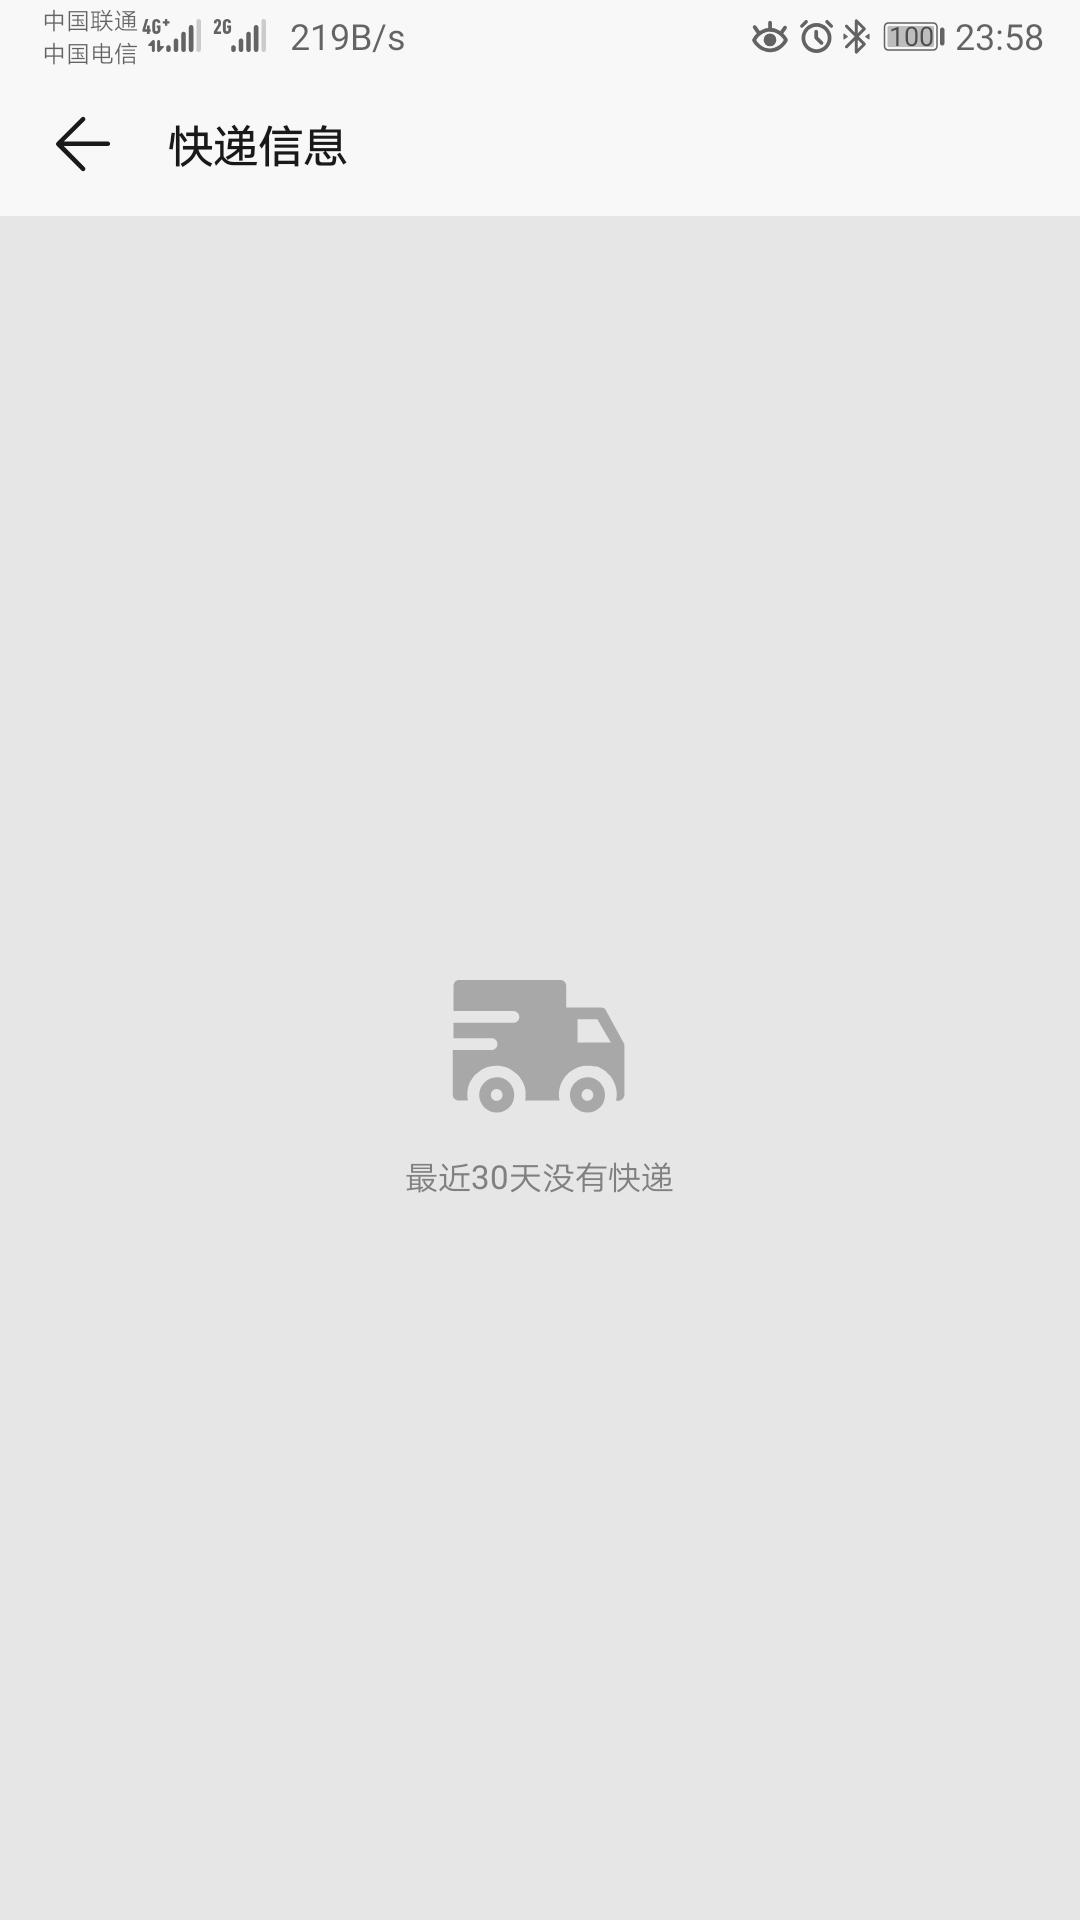 Screenshot_20190711_235802_com.huawei.intelligent.jpg